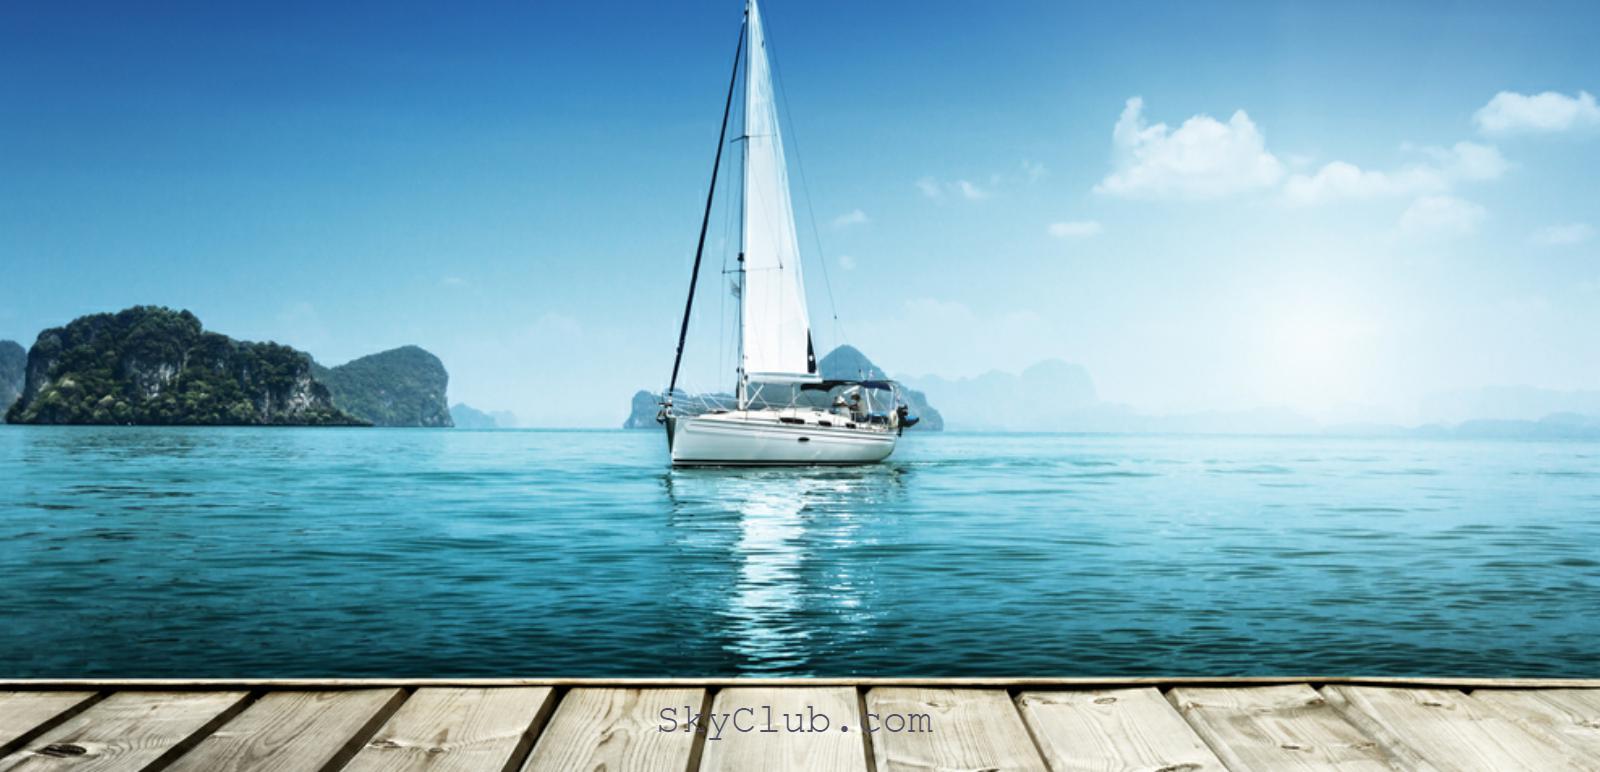 sc-yacht-charter-blog_block_1